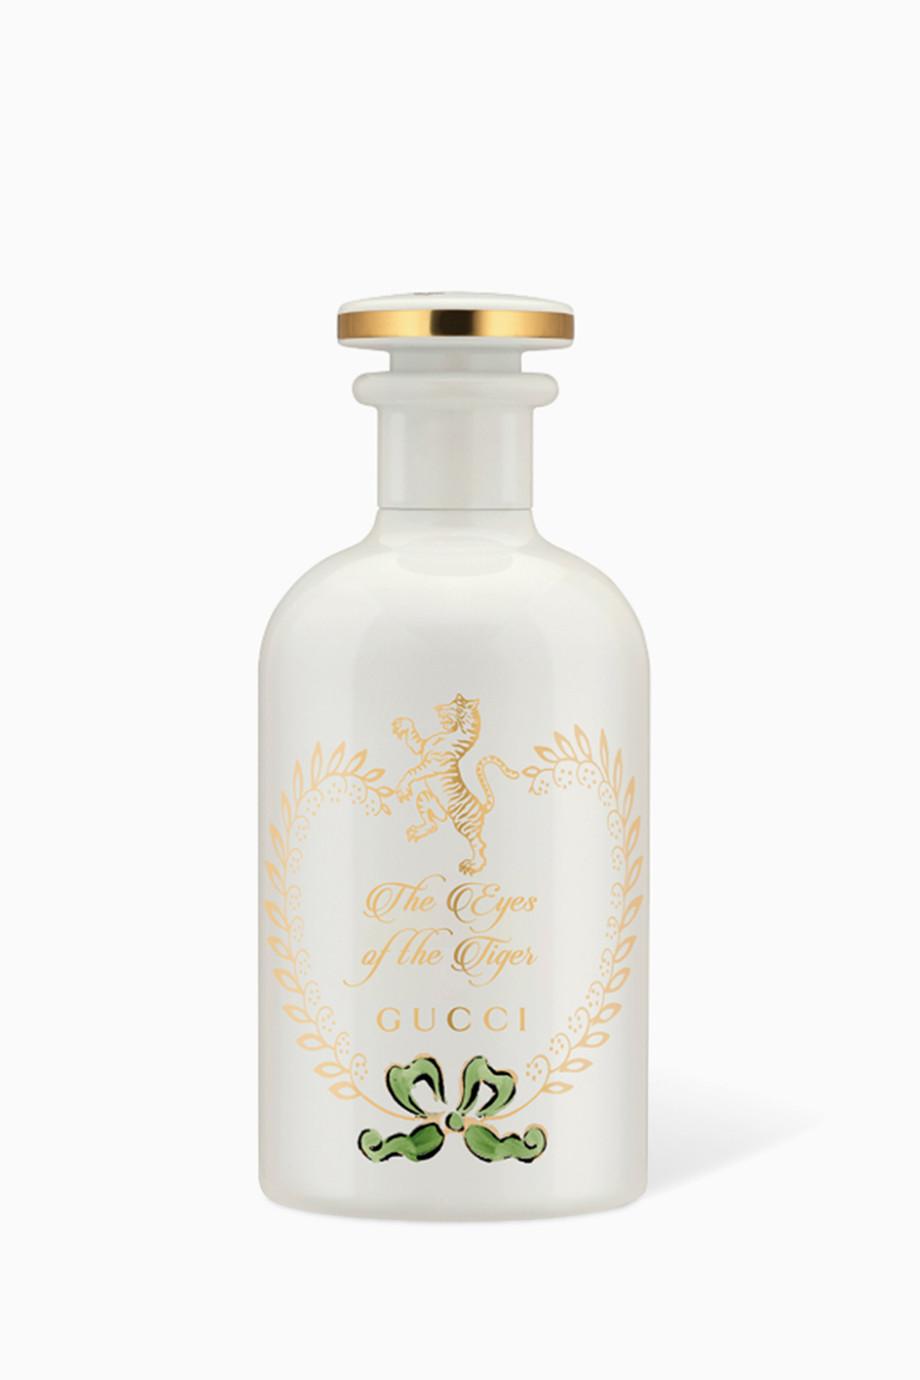 2b1d89a4d تسوق ماء عطر ذا أيز أوف ذا تايغر، 100 ملل Gucci Perfumes ملون للنساء ...